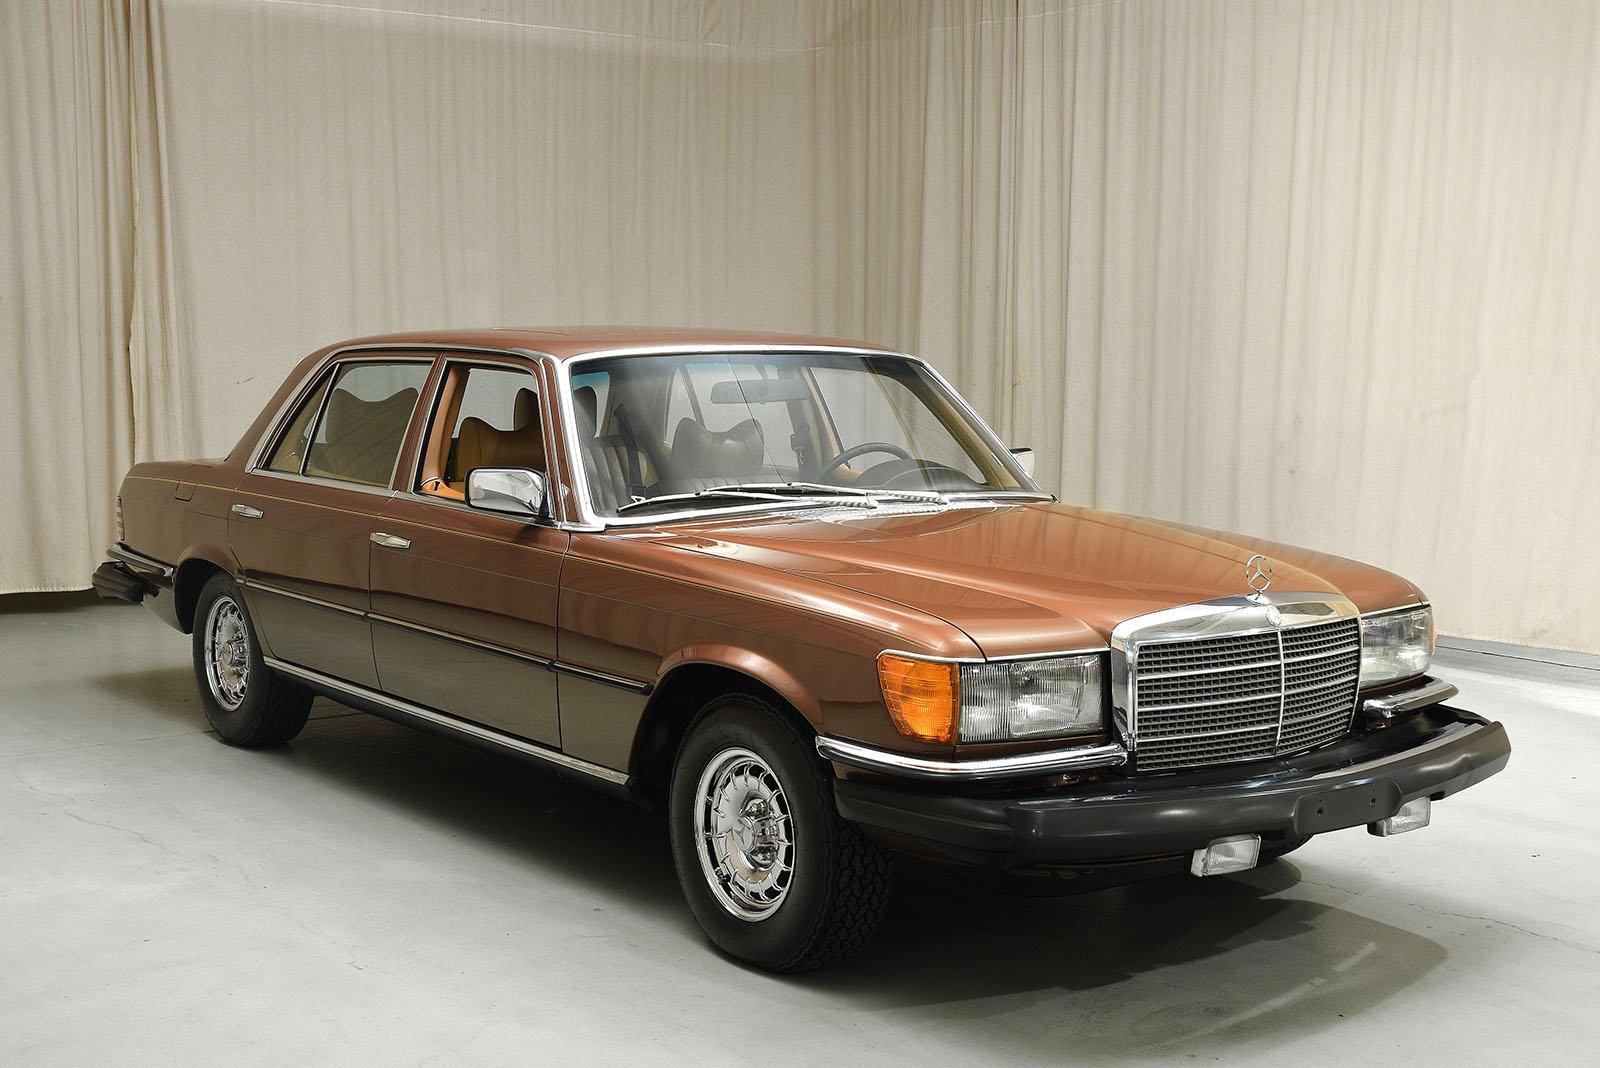 1979 mercedes benz 450 sel 6 9 sedan hyman ltd classic for Mercedes benz 450 sel 6 9